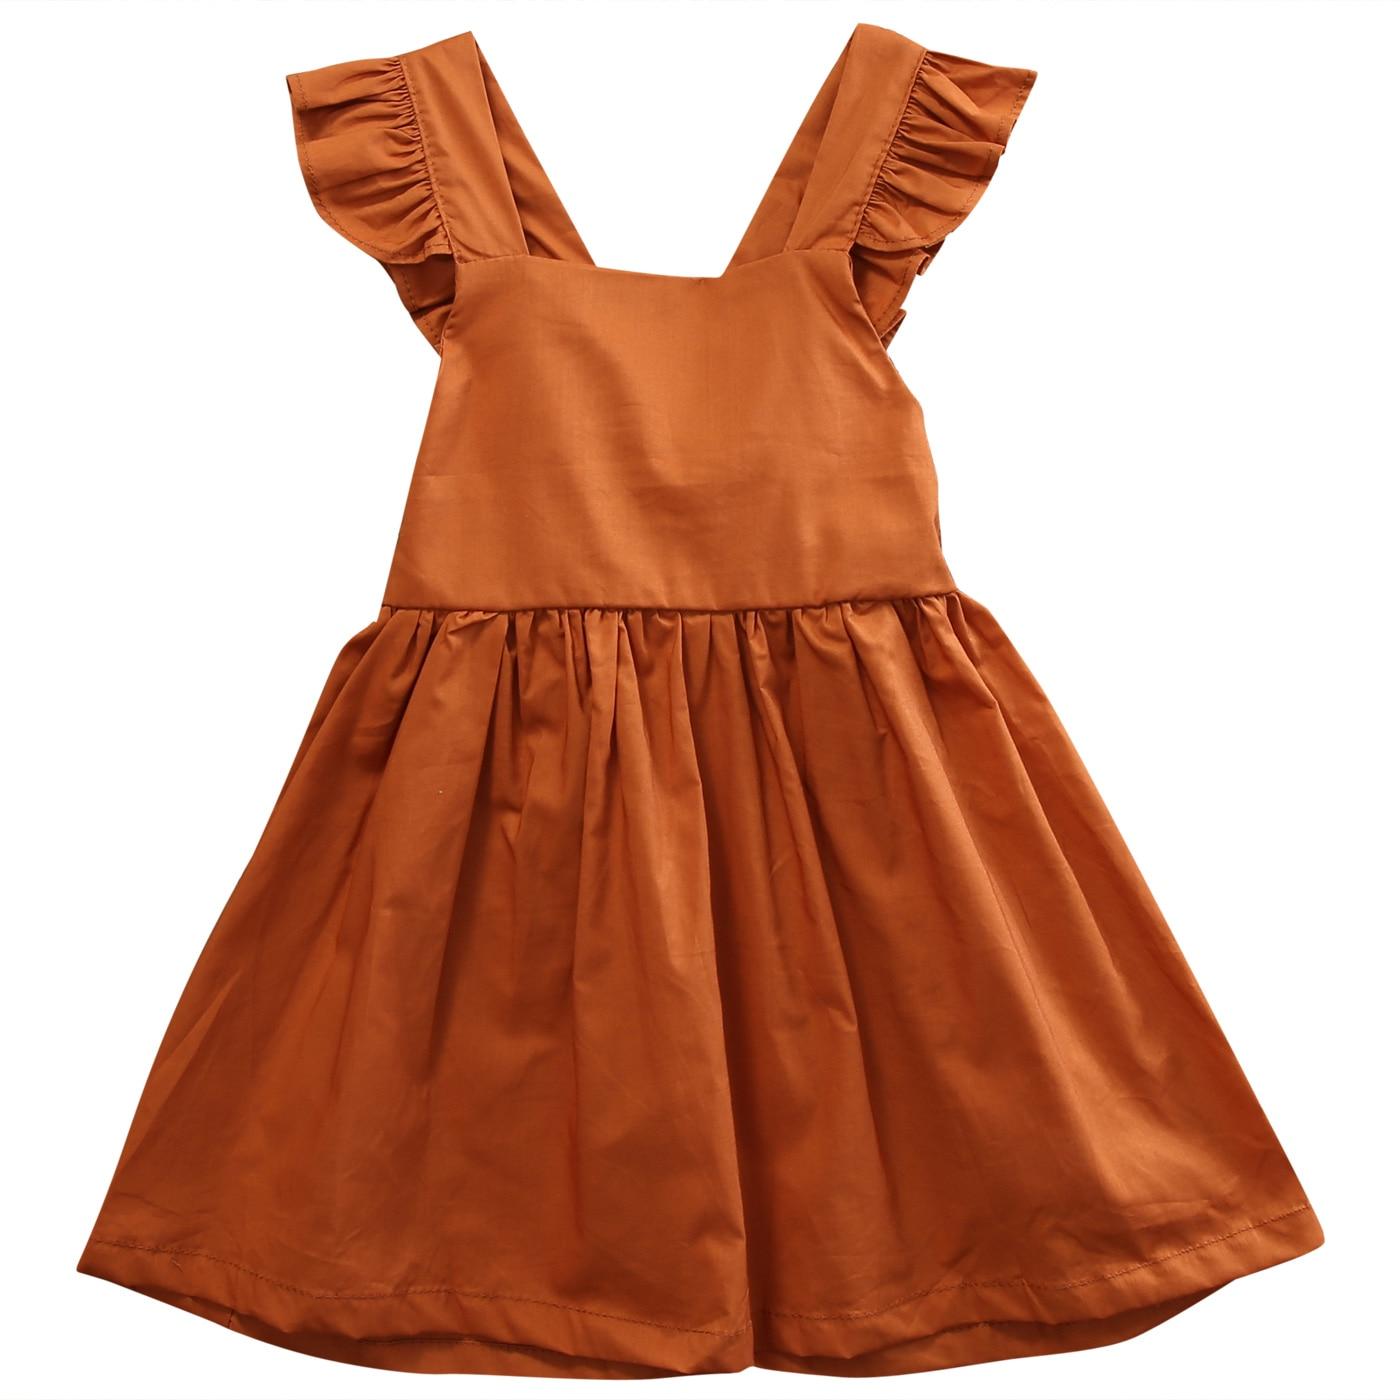 2017 Summer Baby Girls font b Dress b font Cotton Ruffled Vest font b Dress b